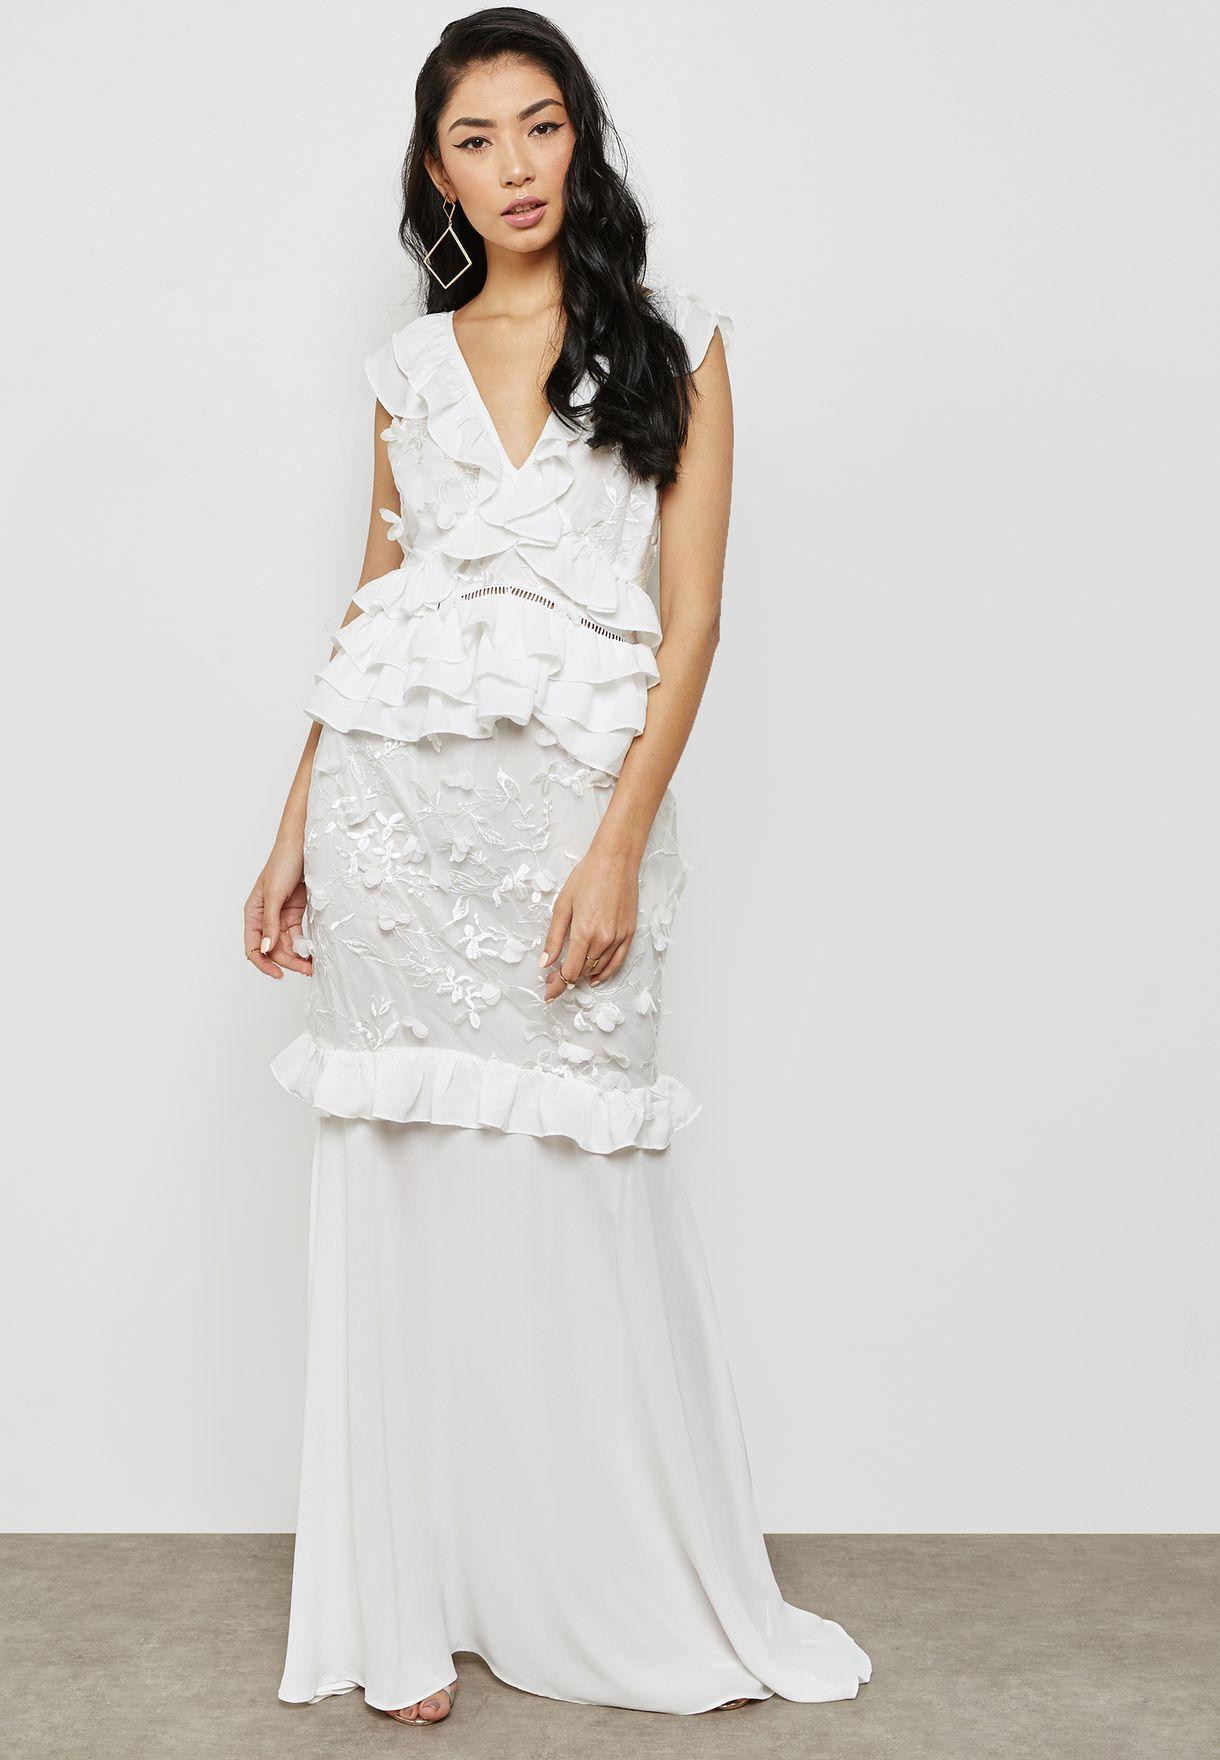 فستان مكسي مزين بكشكش